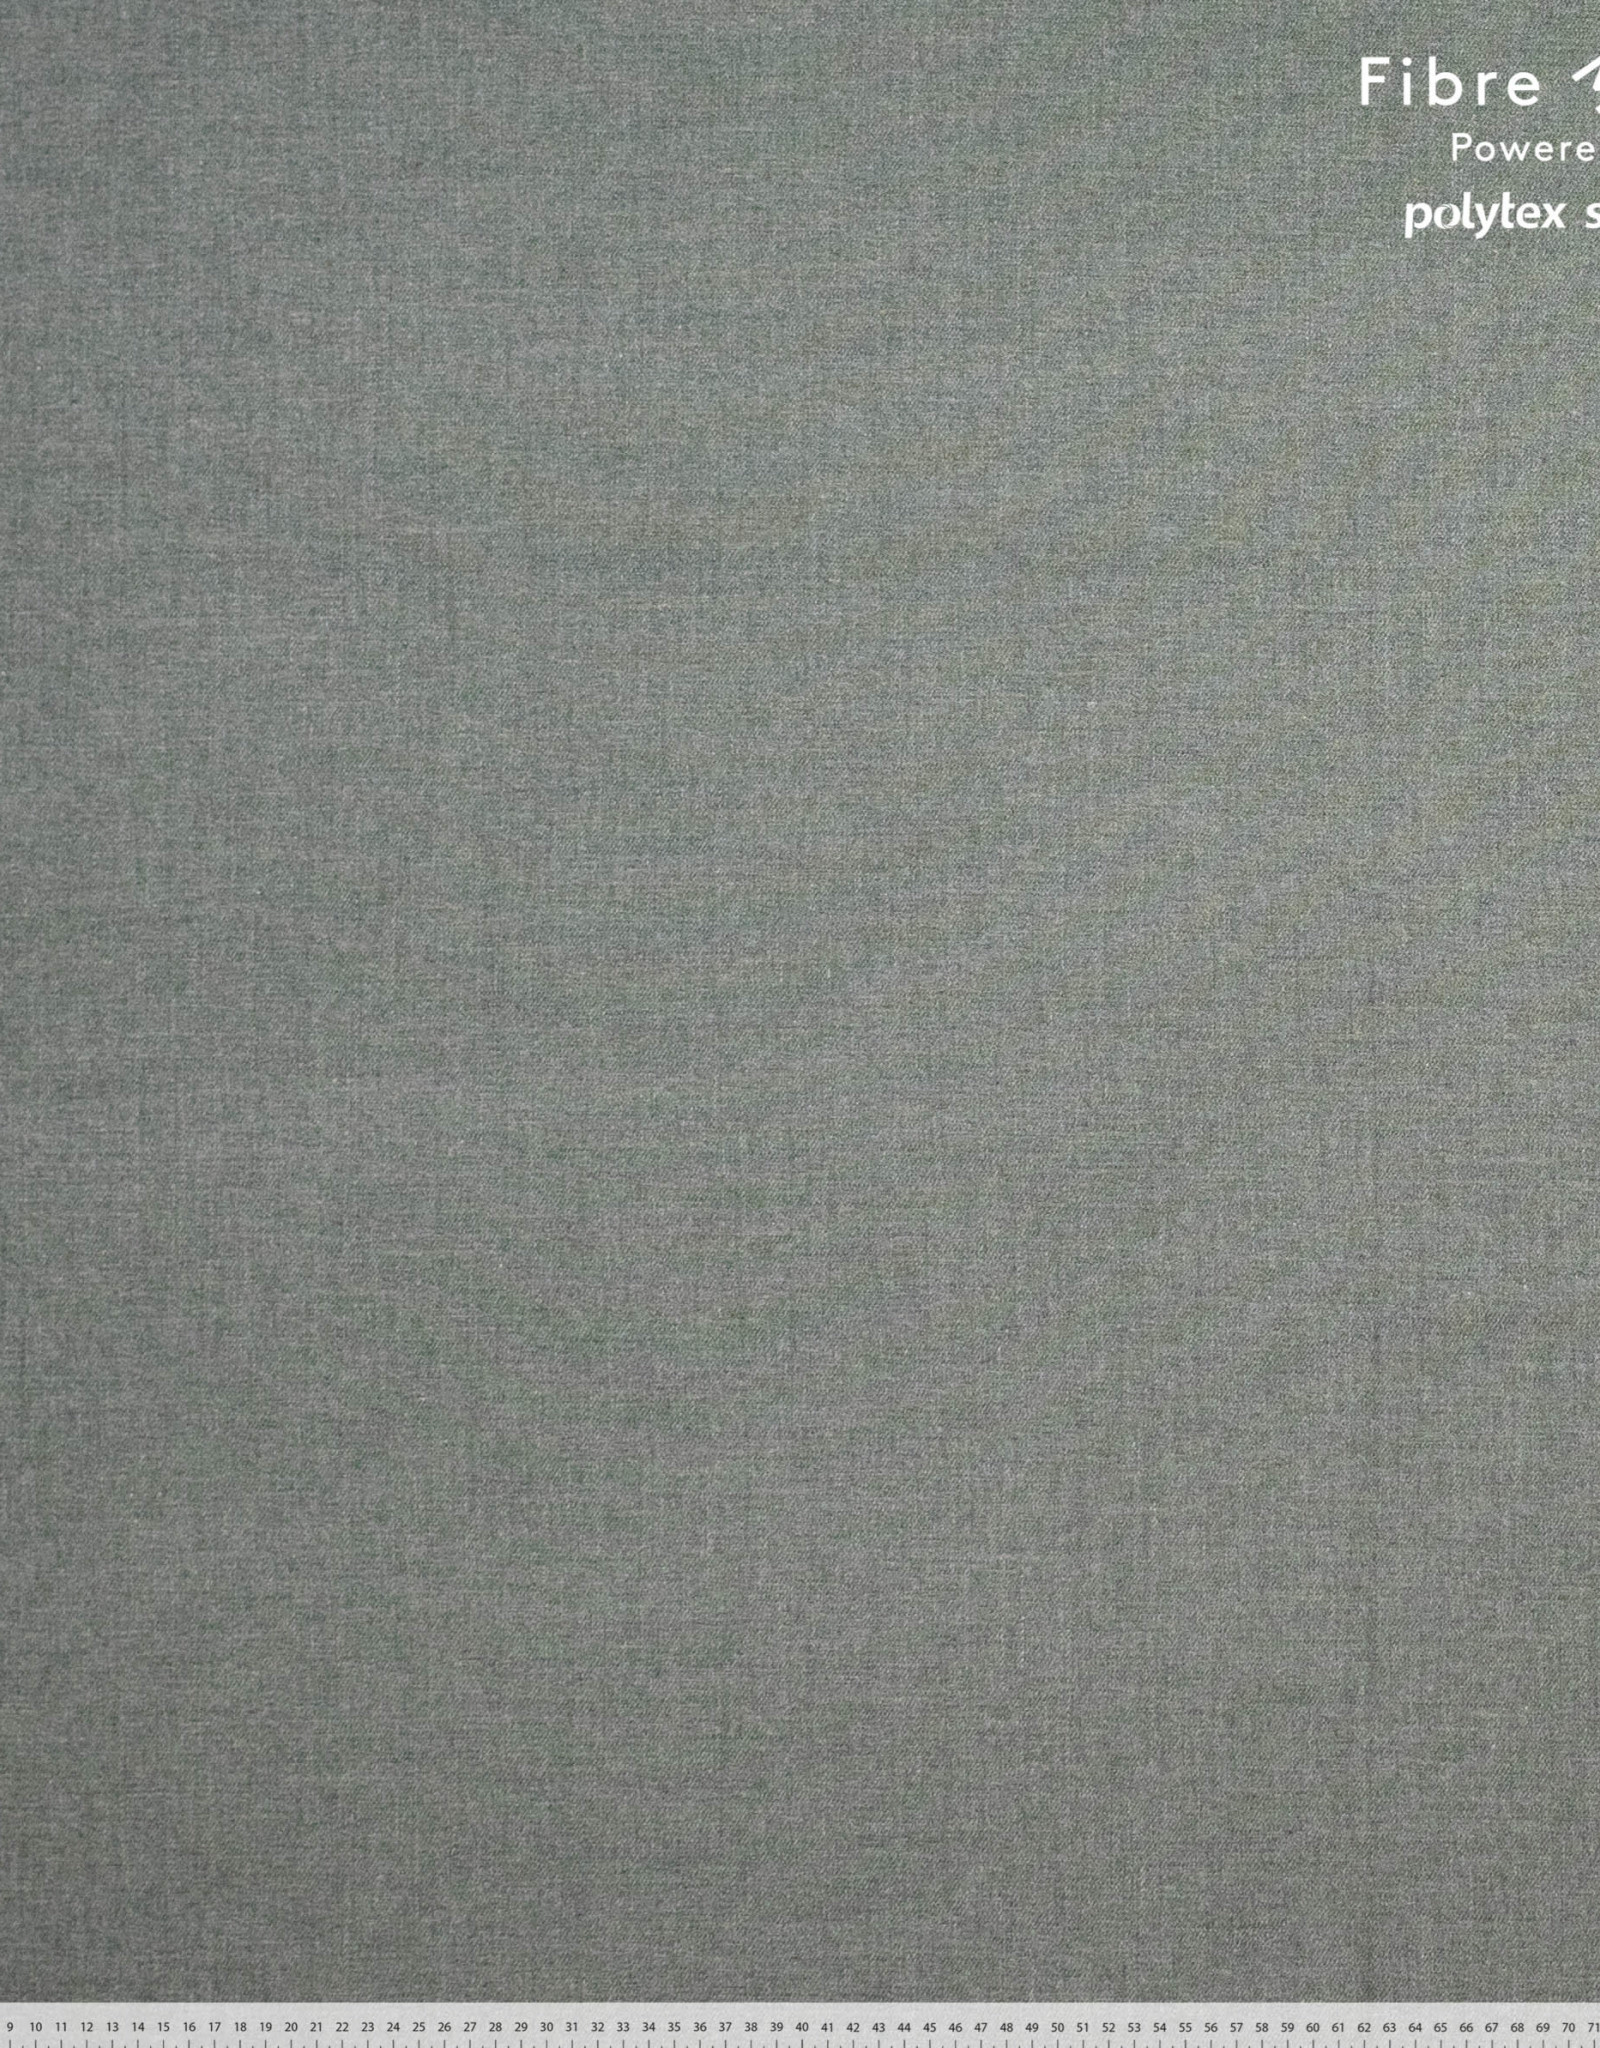 Fibre Mood Fibre Mood ed 14 Woven bamboo/gerycleerd polyester Oud Groen Noelle